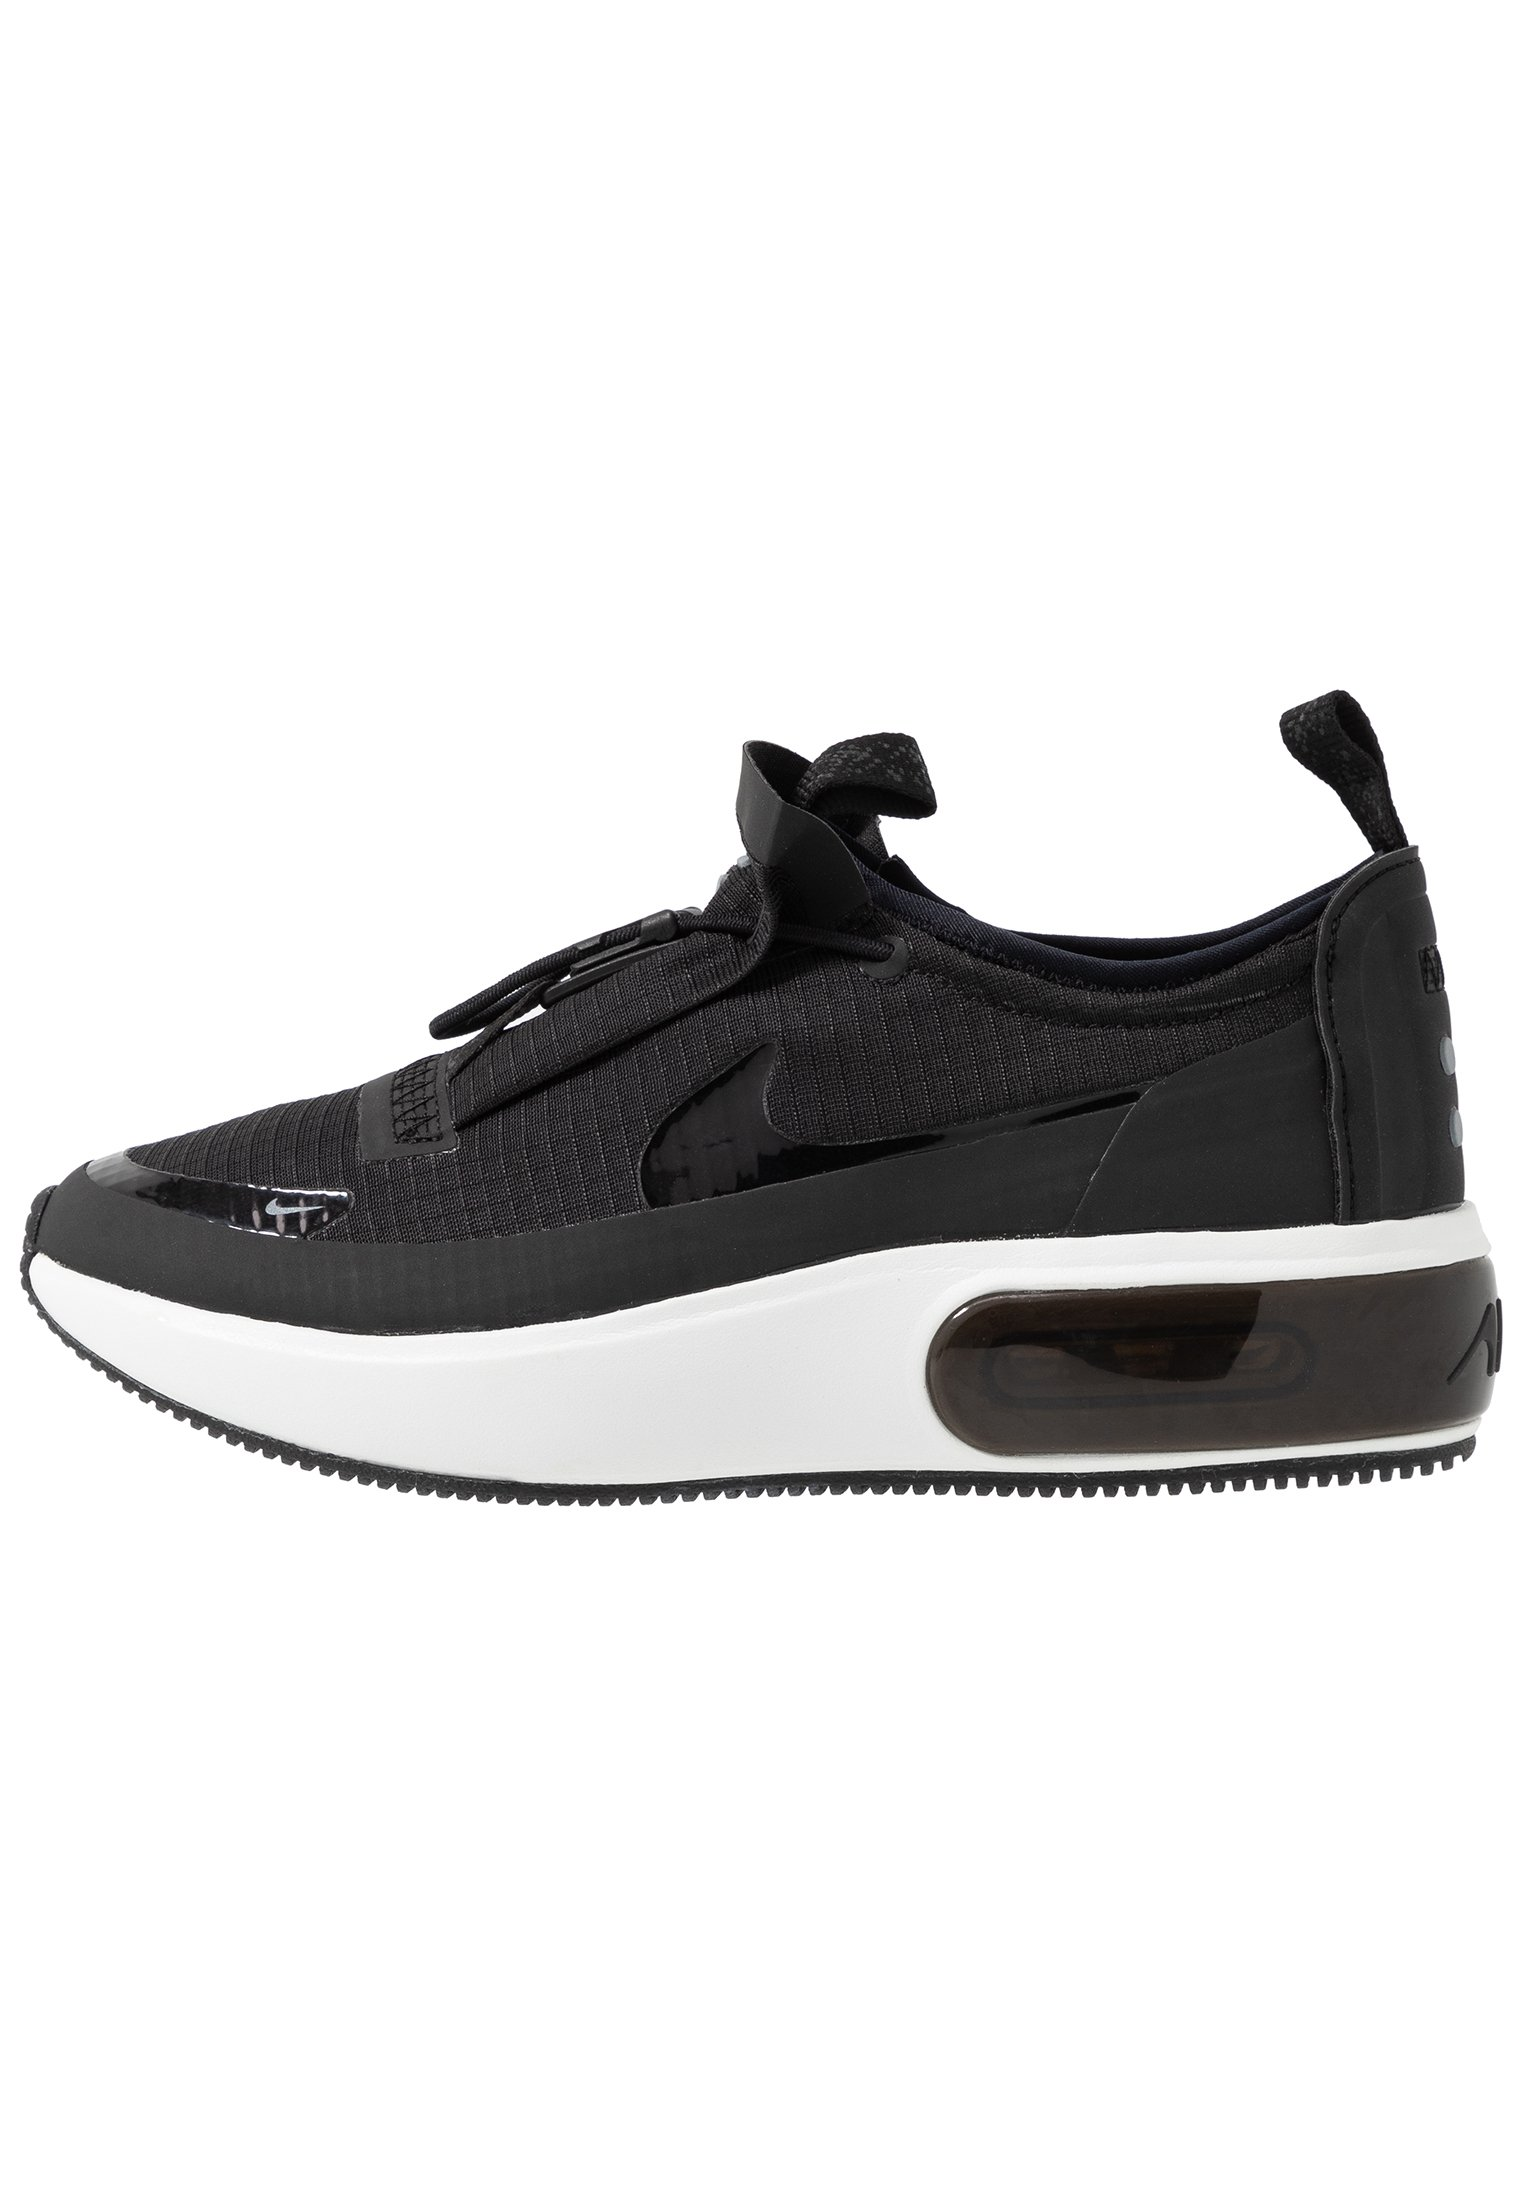 Nike Sportswear Air Max Dia - Sneakers Black/anthracite/summit White